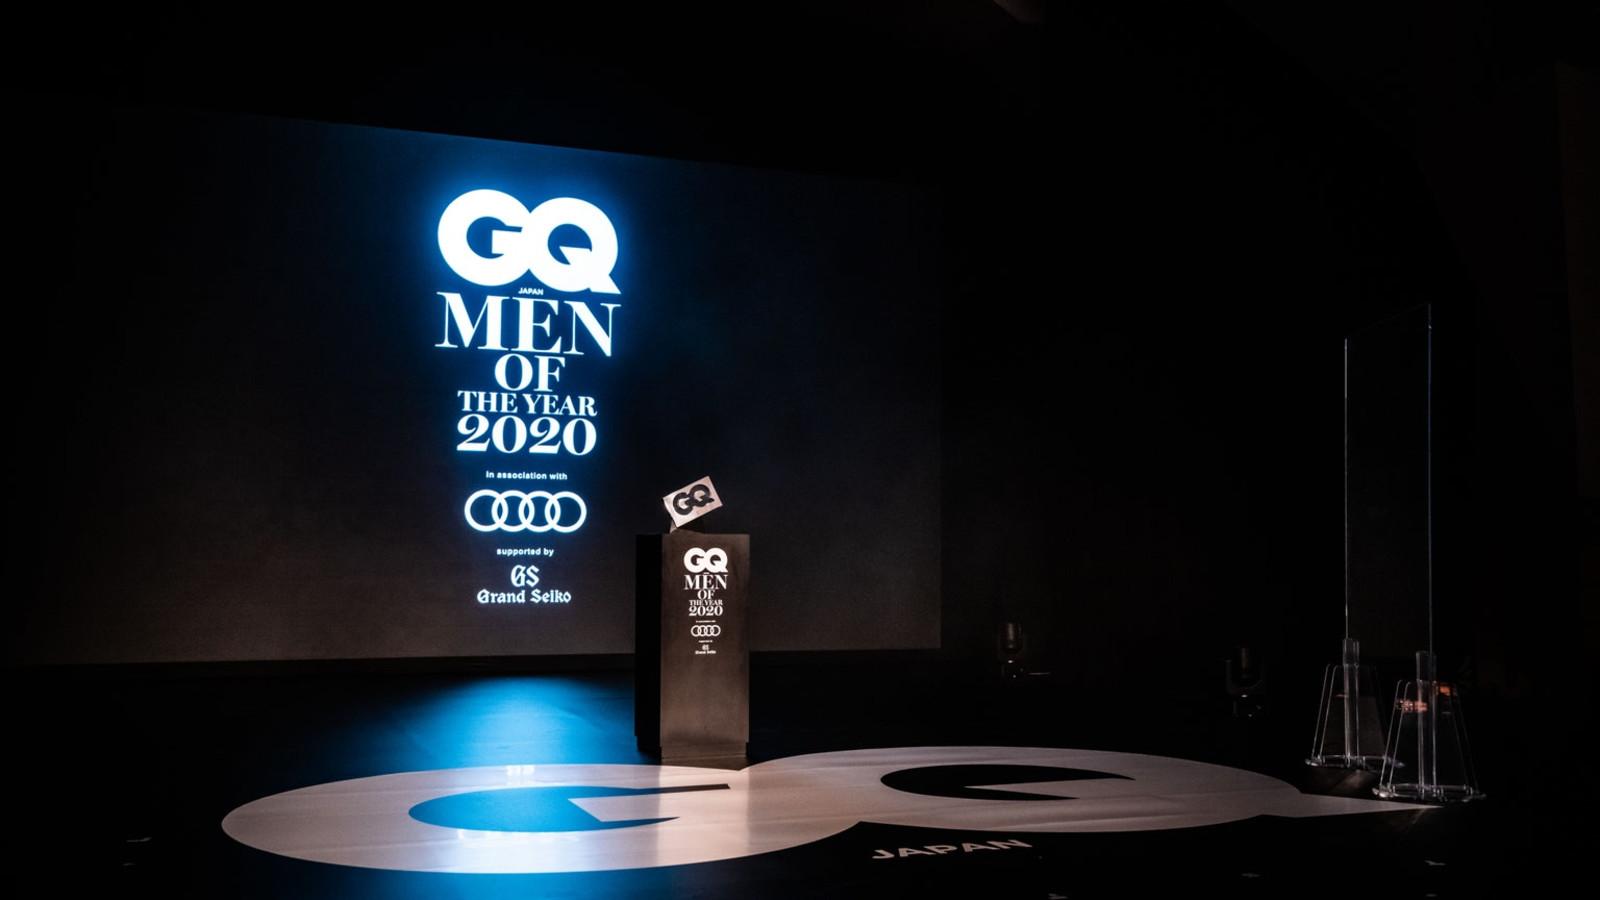 gq-moty-6 - Akihiro Tsue - Japan - GQ MOTY